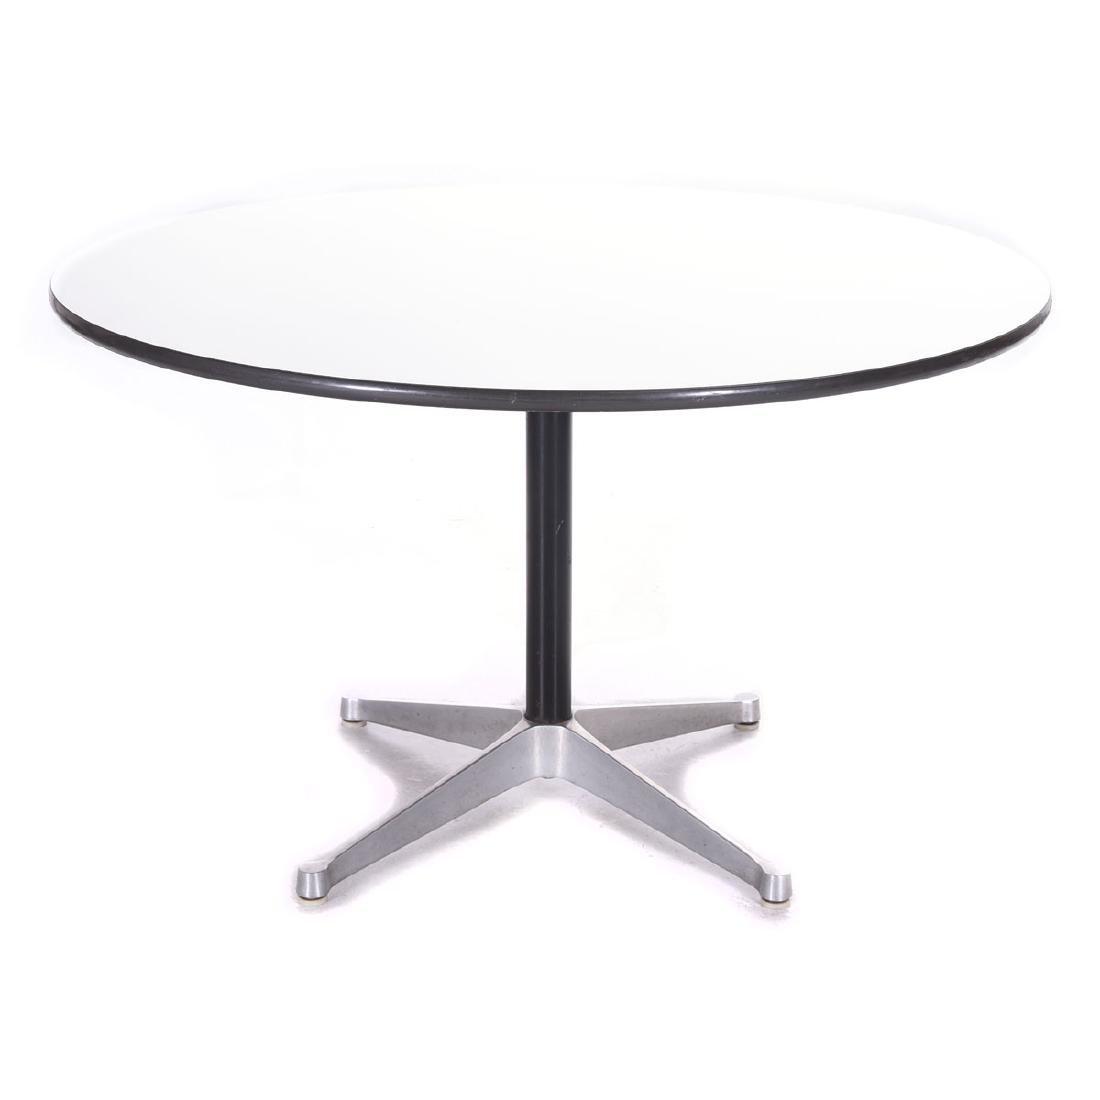 Eames for Herman Miller Formica Table